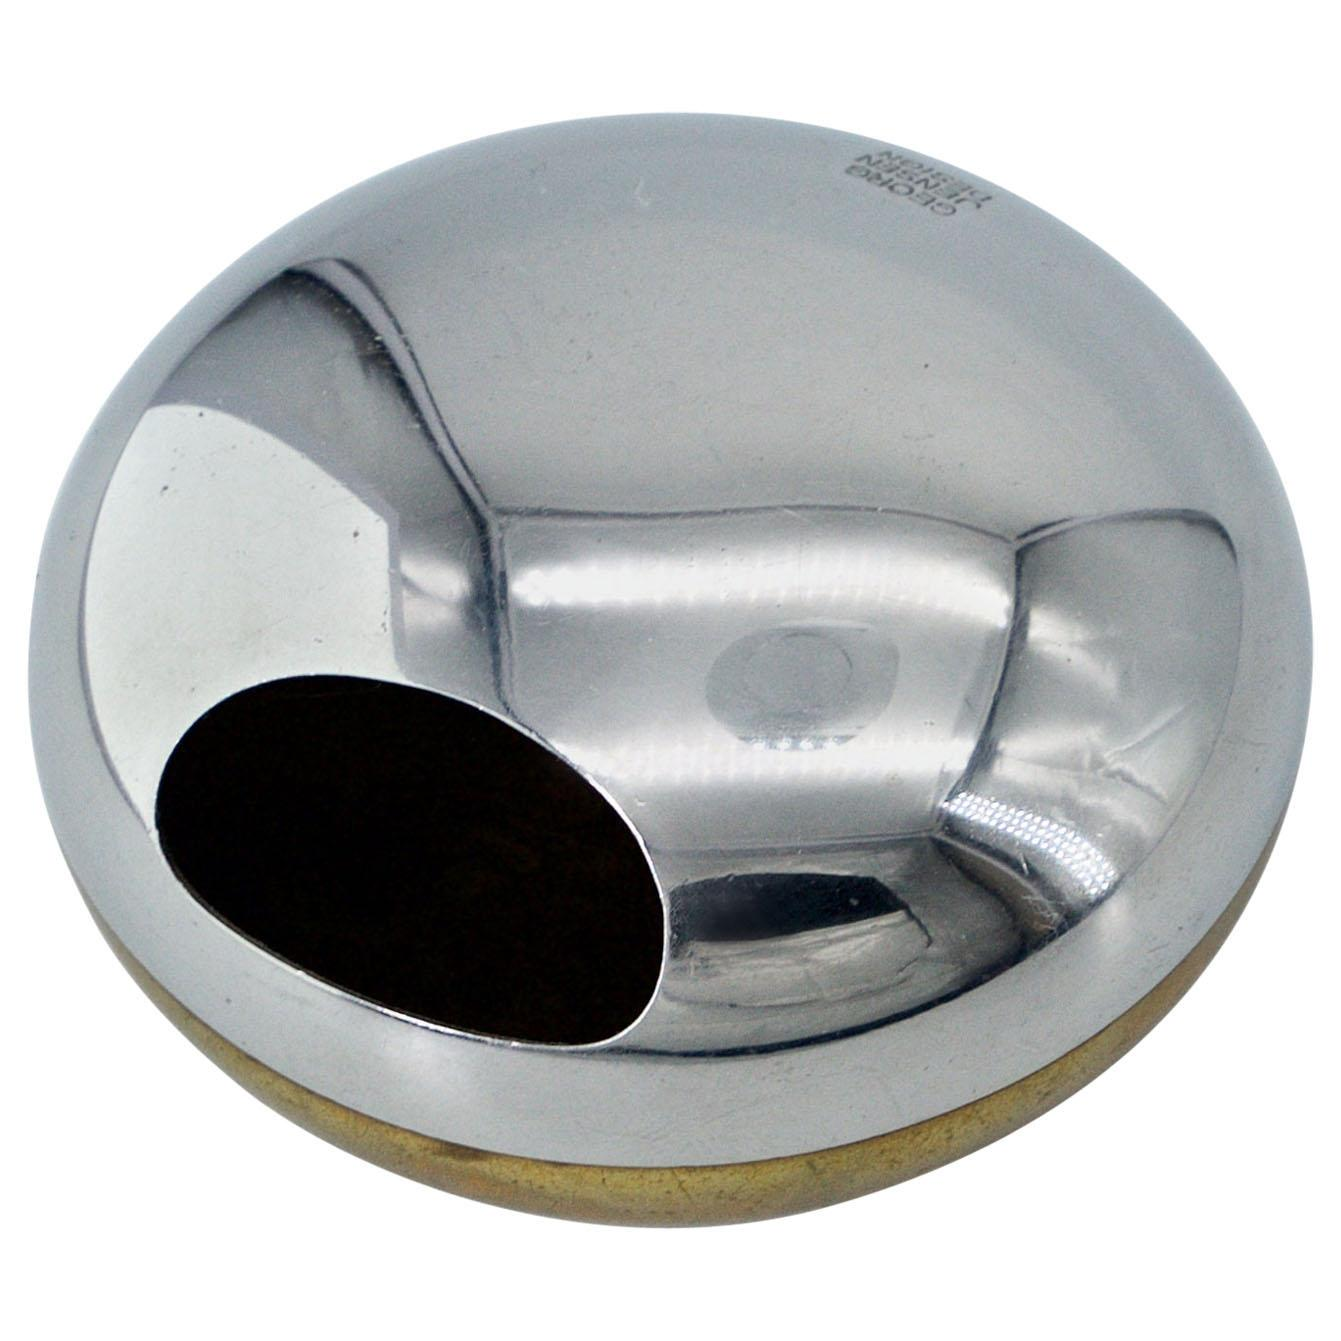 Danish Georg Jensen Orb Egg Sculpture Ashtray Chrome Brass Paperweight Bowl Ball